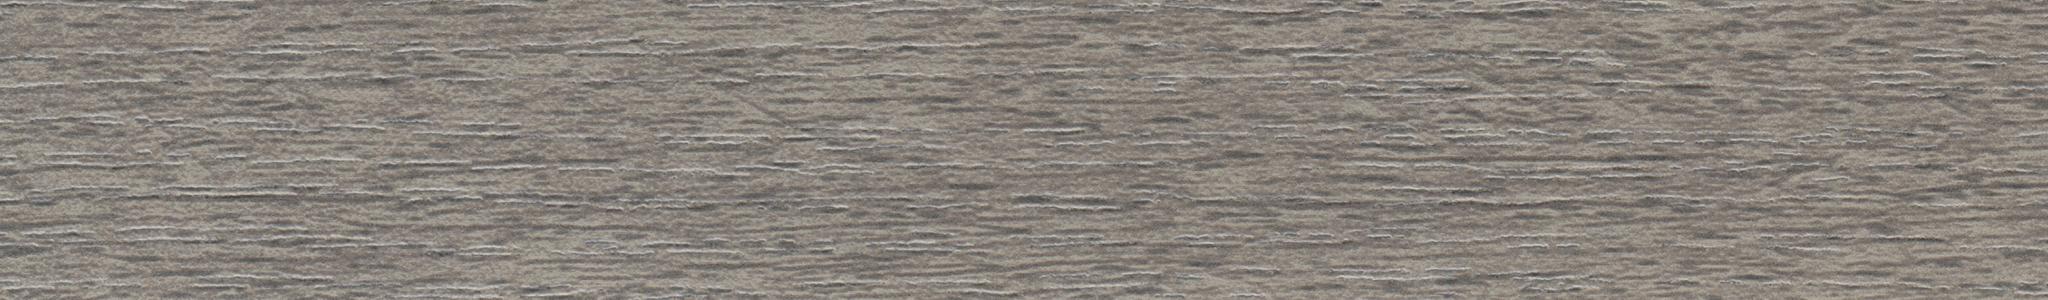 HD 294421 ABS hrana metalwood gravír